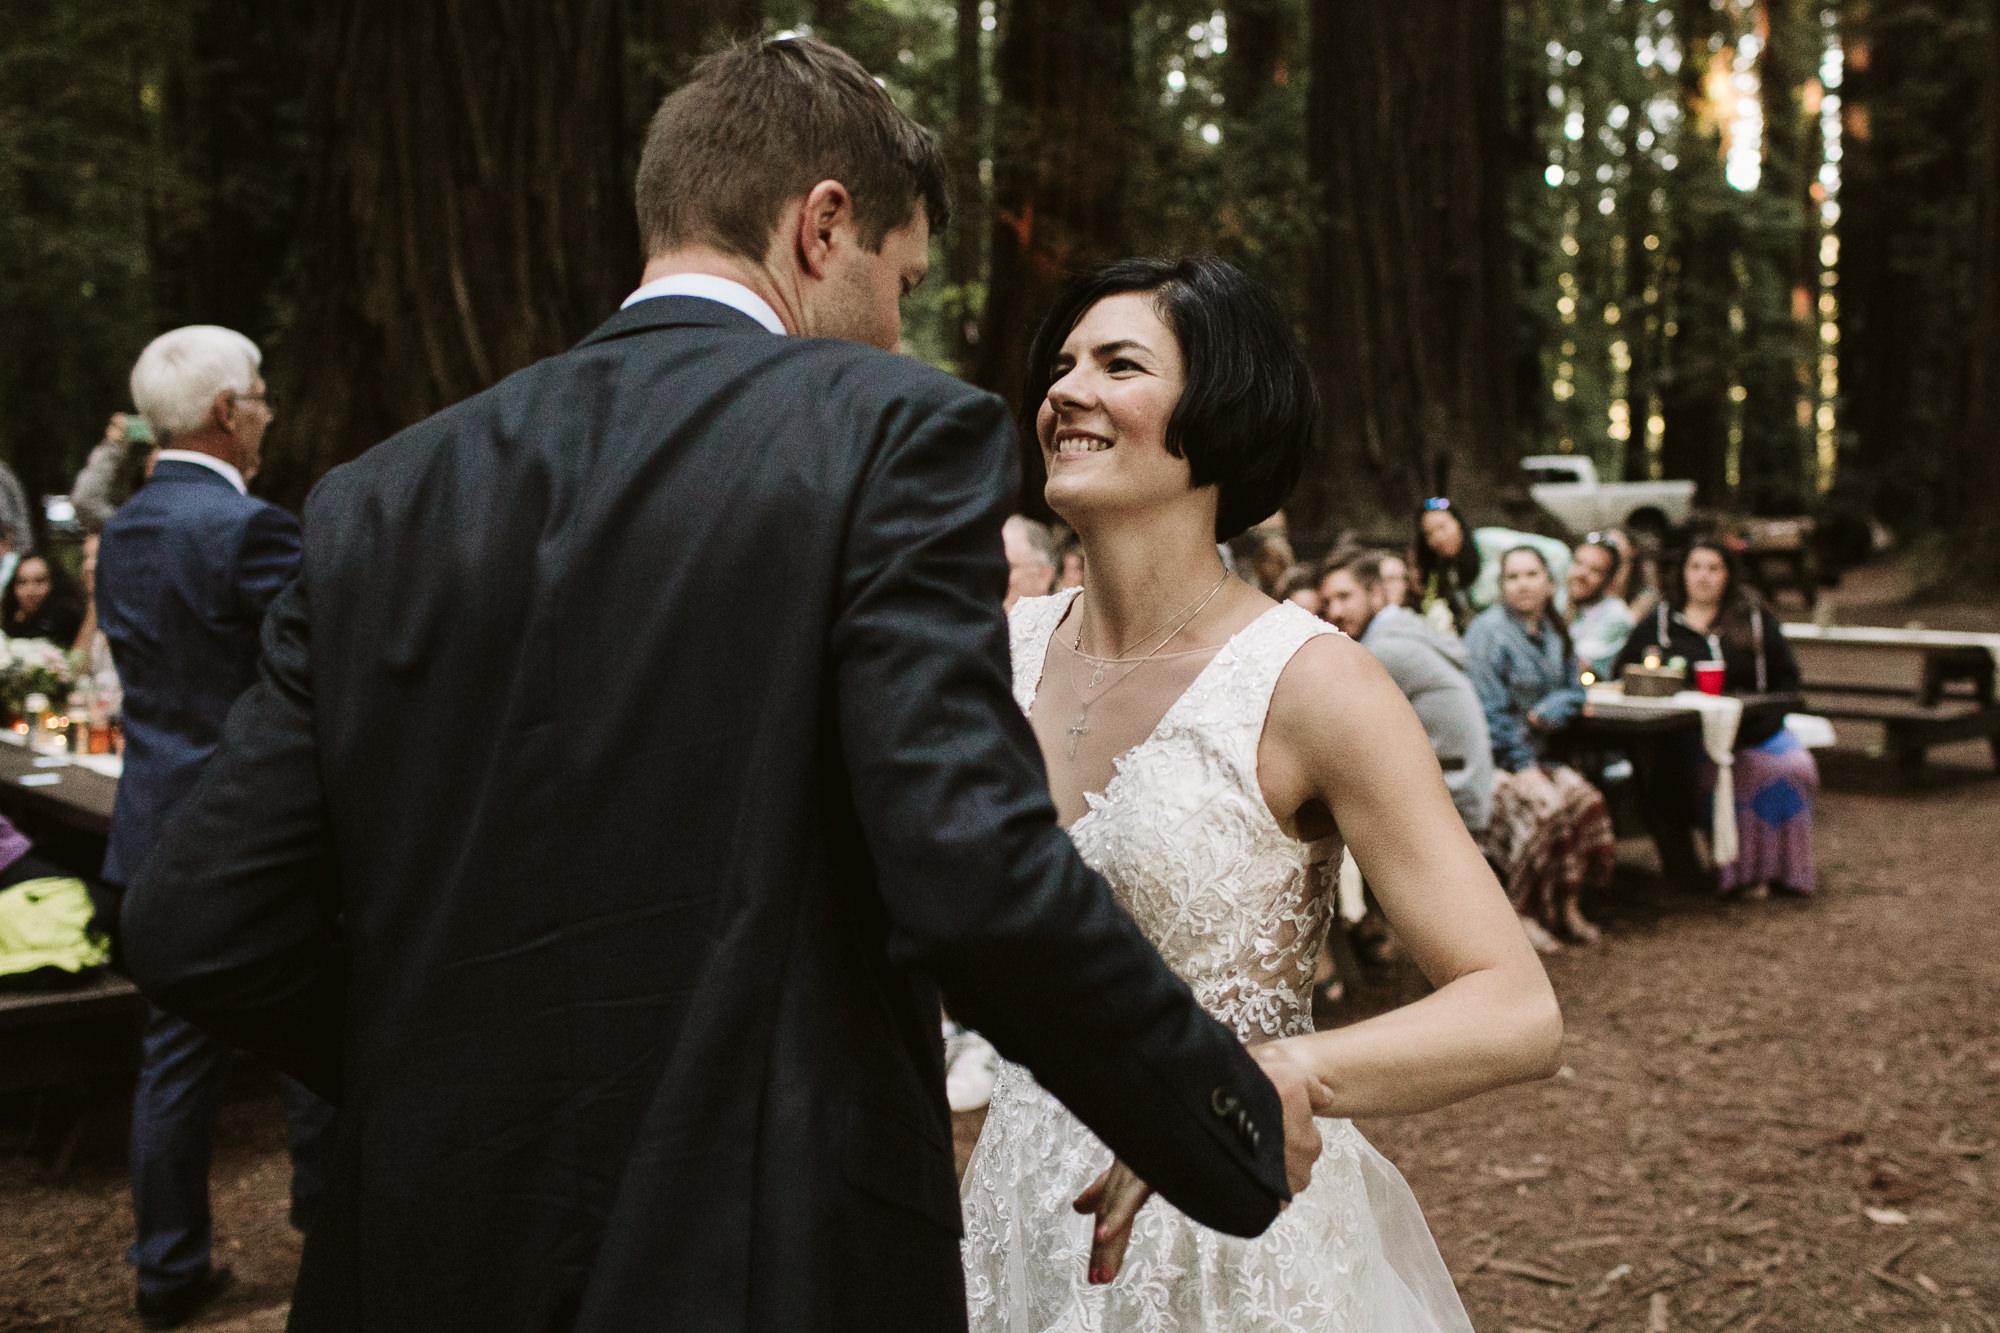 California-wedding-photographer-alfonso-flores-pamplin-groove-328.jpg